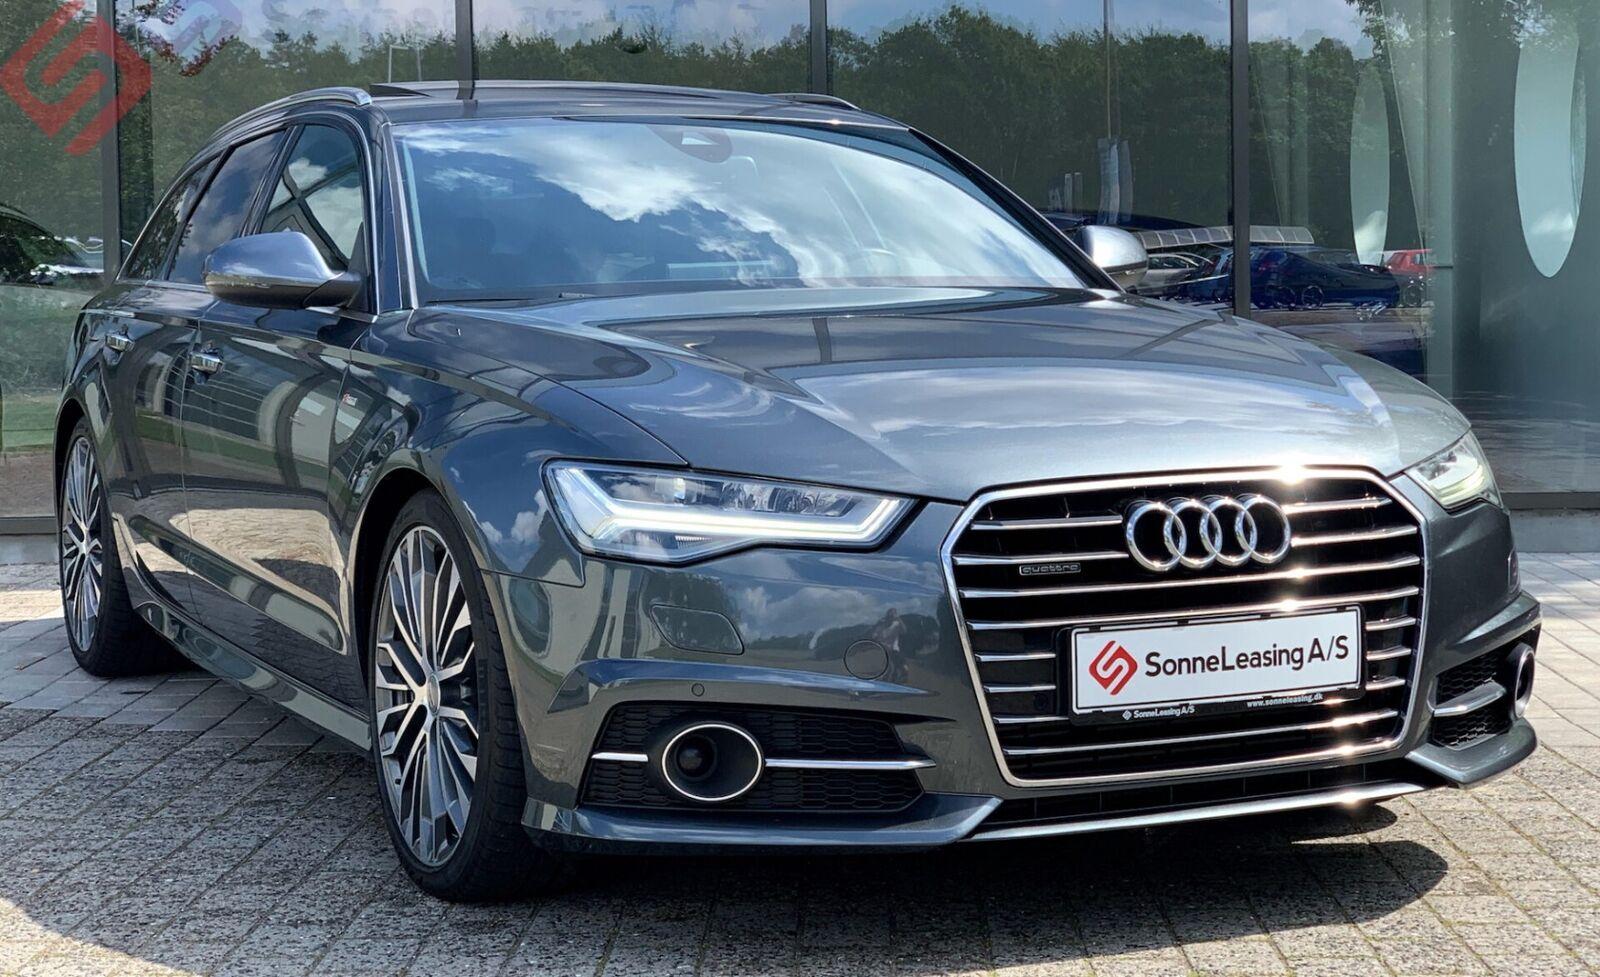 Audi A6 3,0 TDi 320 S-line Avant quat. Tip 5d - 3.196 kr.